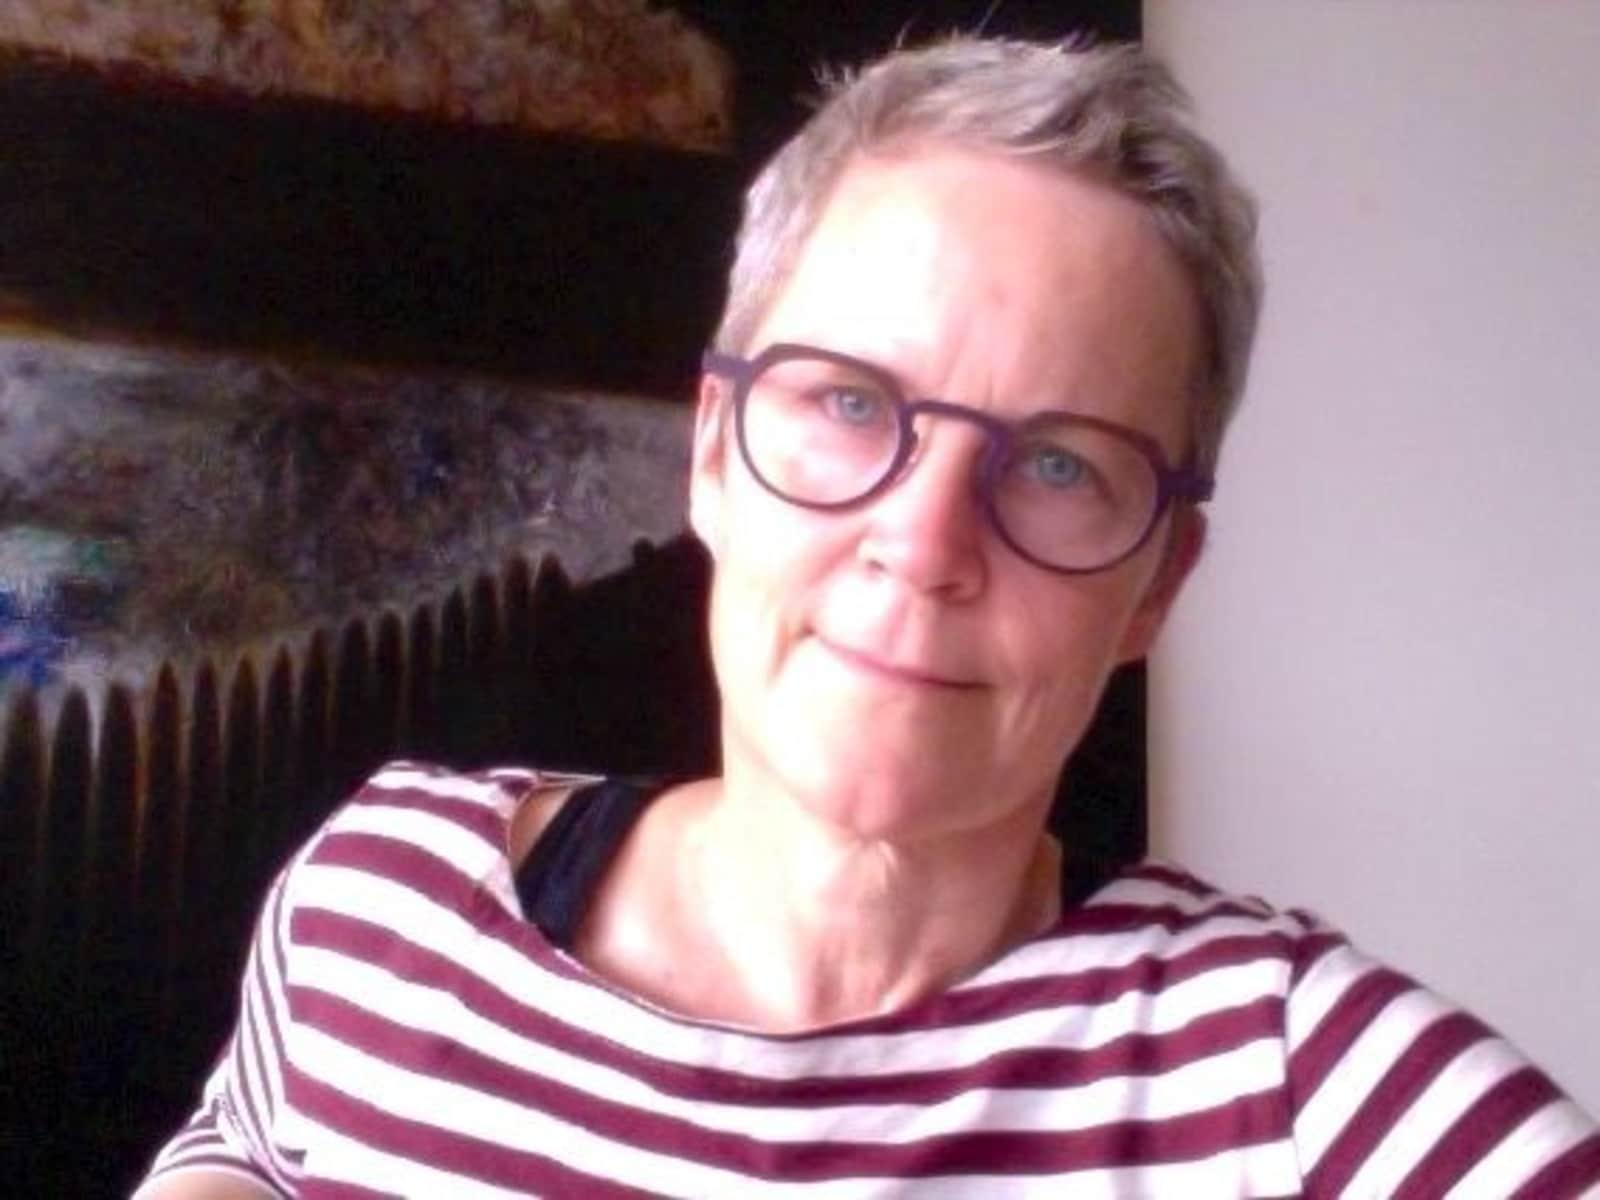 Susan from Canberra, Australian Capital Territory, Australia